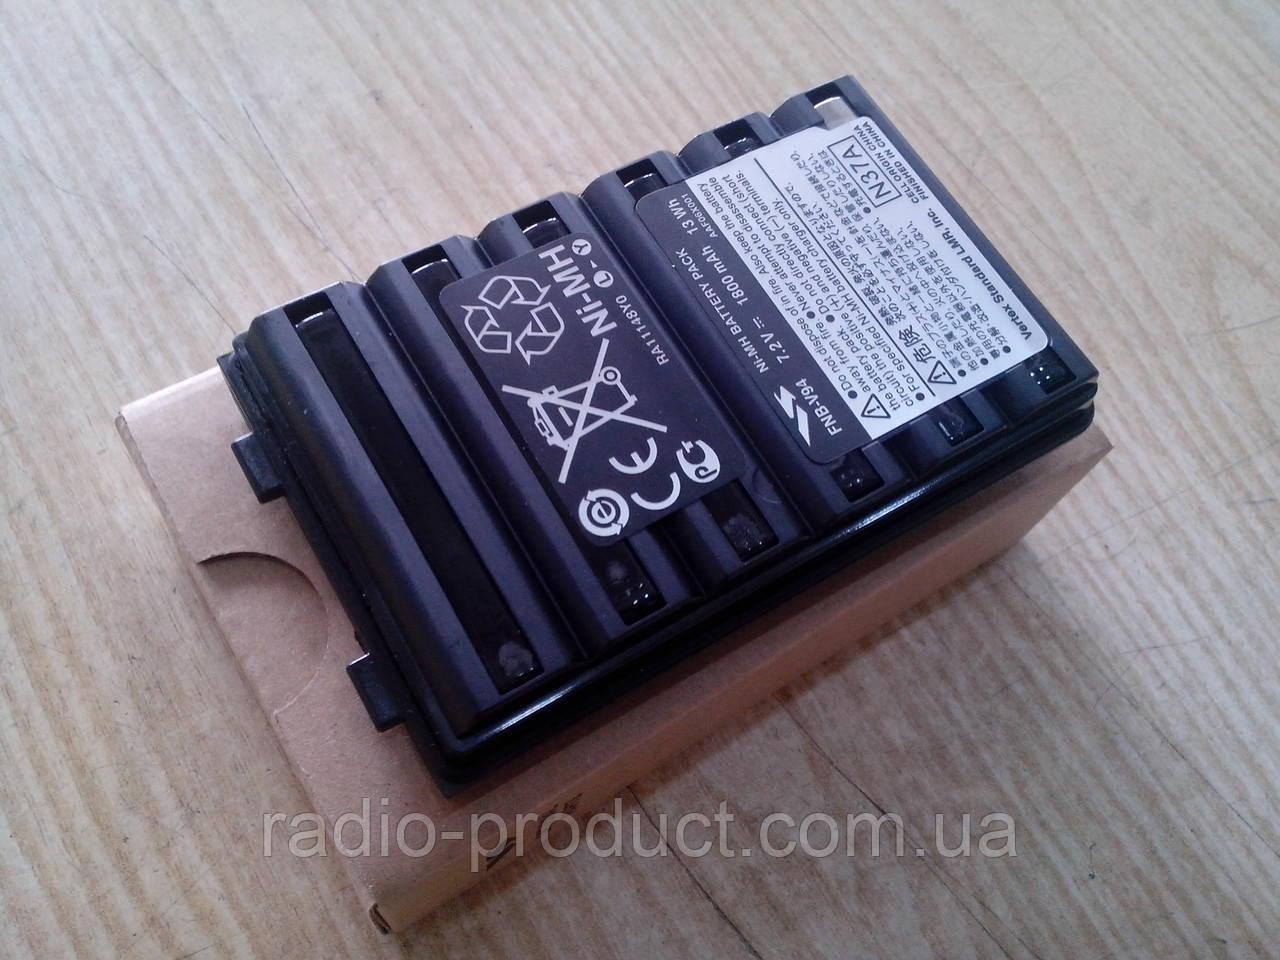 FNB-V94, АКБ для рации, радиостанции Yaesu, Vertex, оригинал